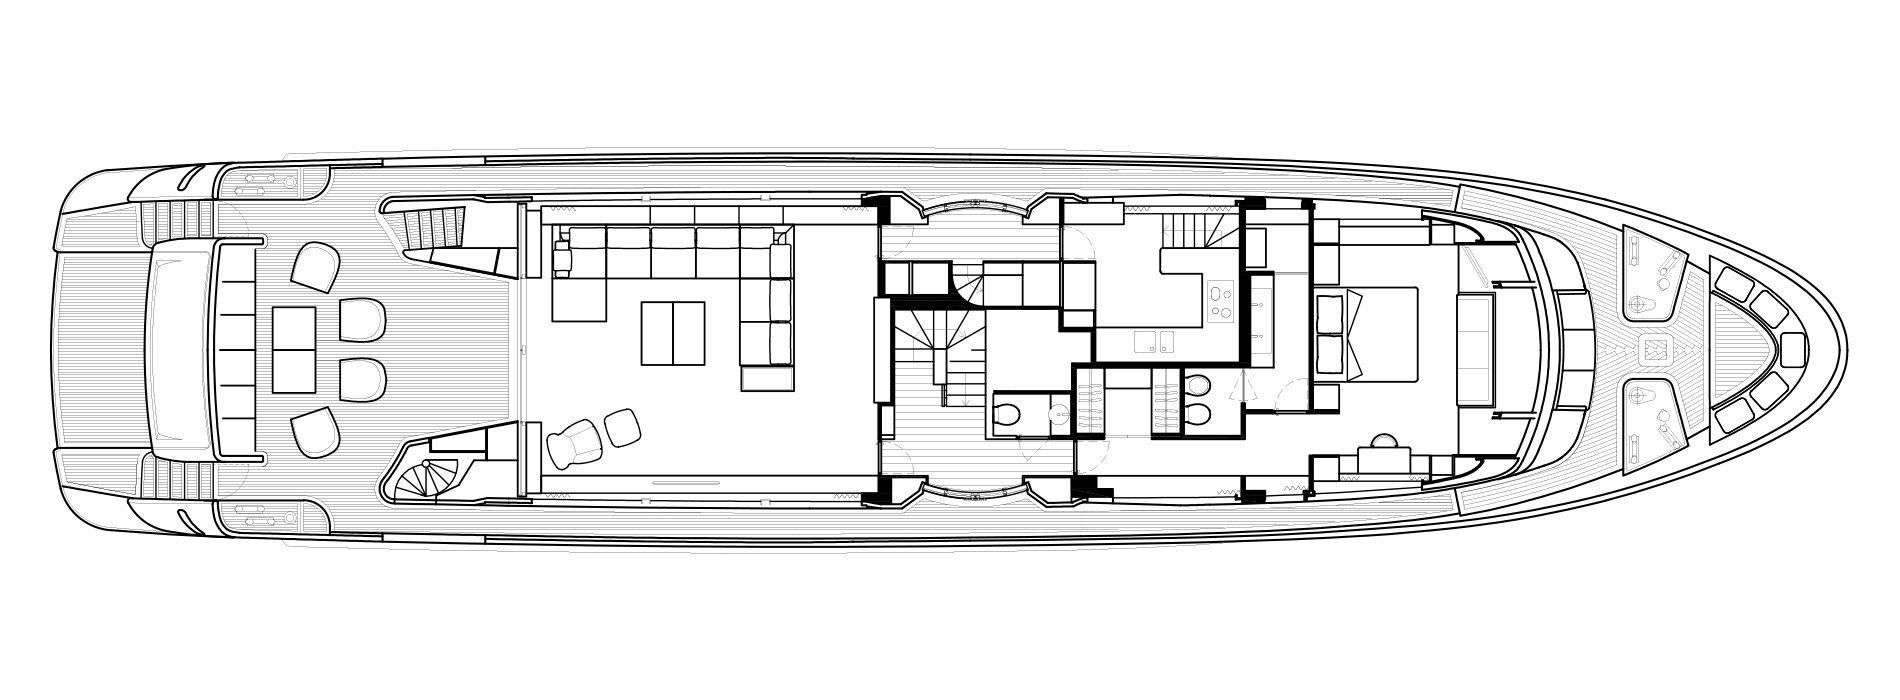 Sanlorenzo Yachts SD112 Cubierta principal Versione B